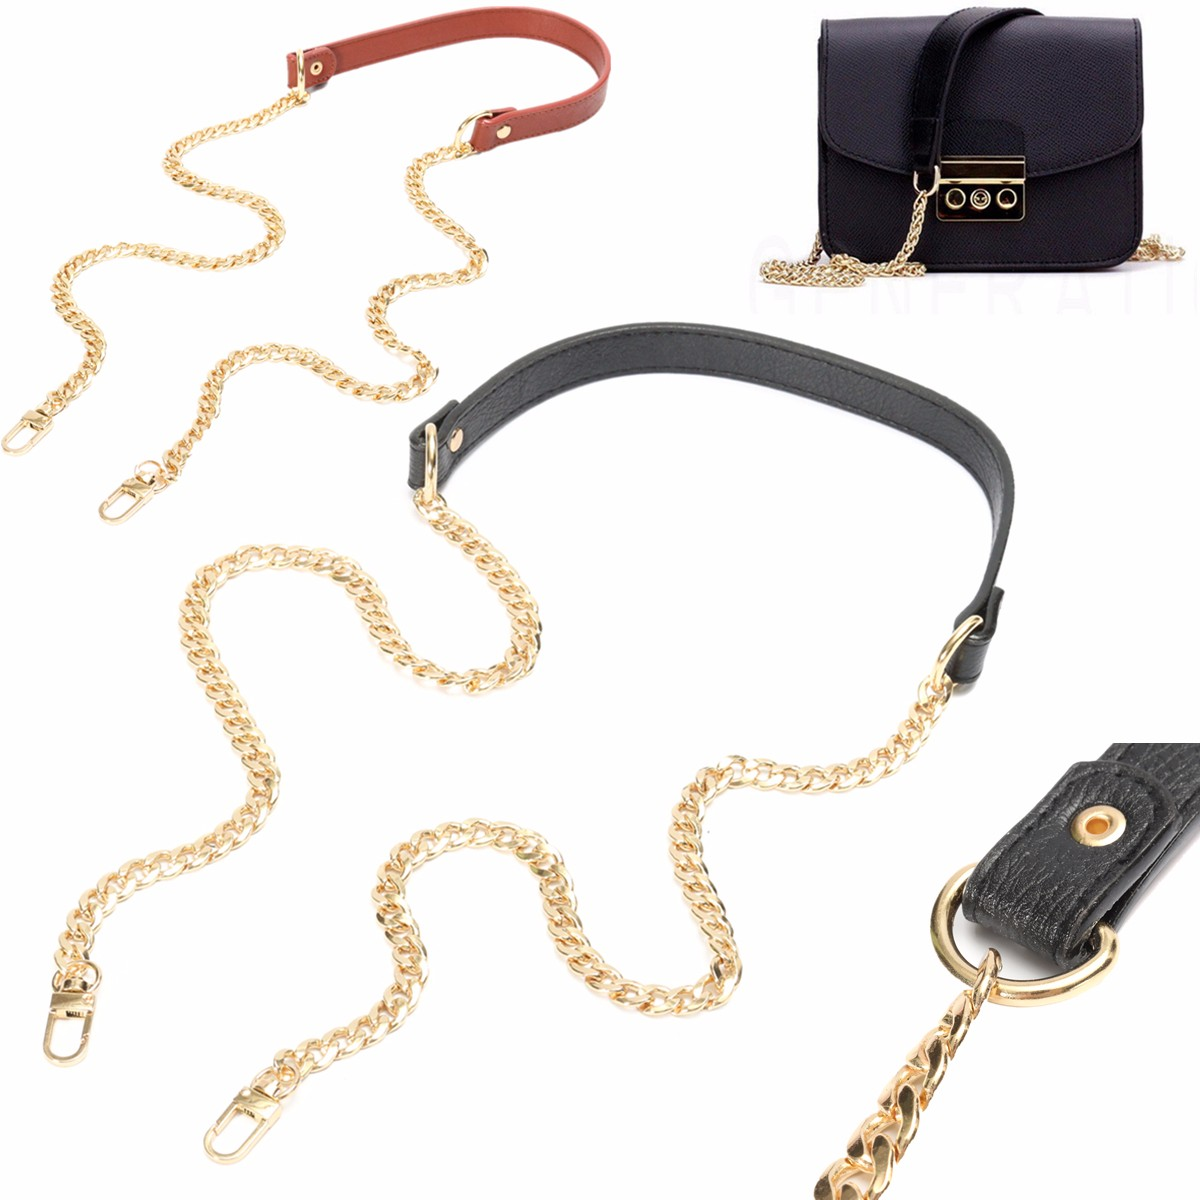 120cm Chain Straps Gold Long Replacement Shoulder Belts